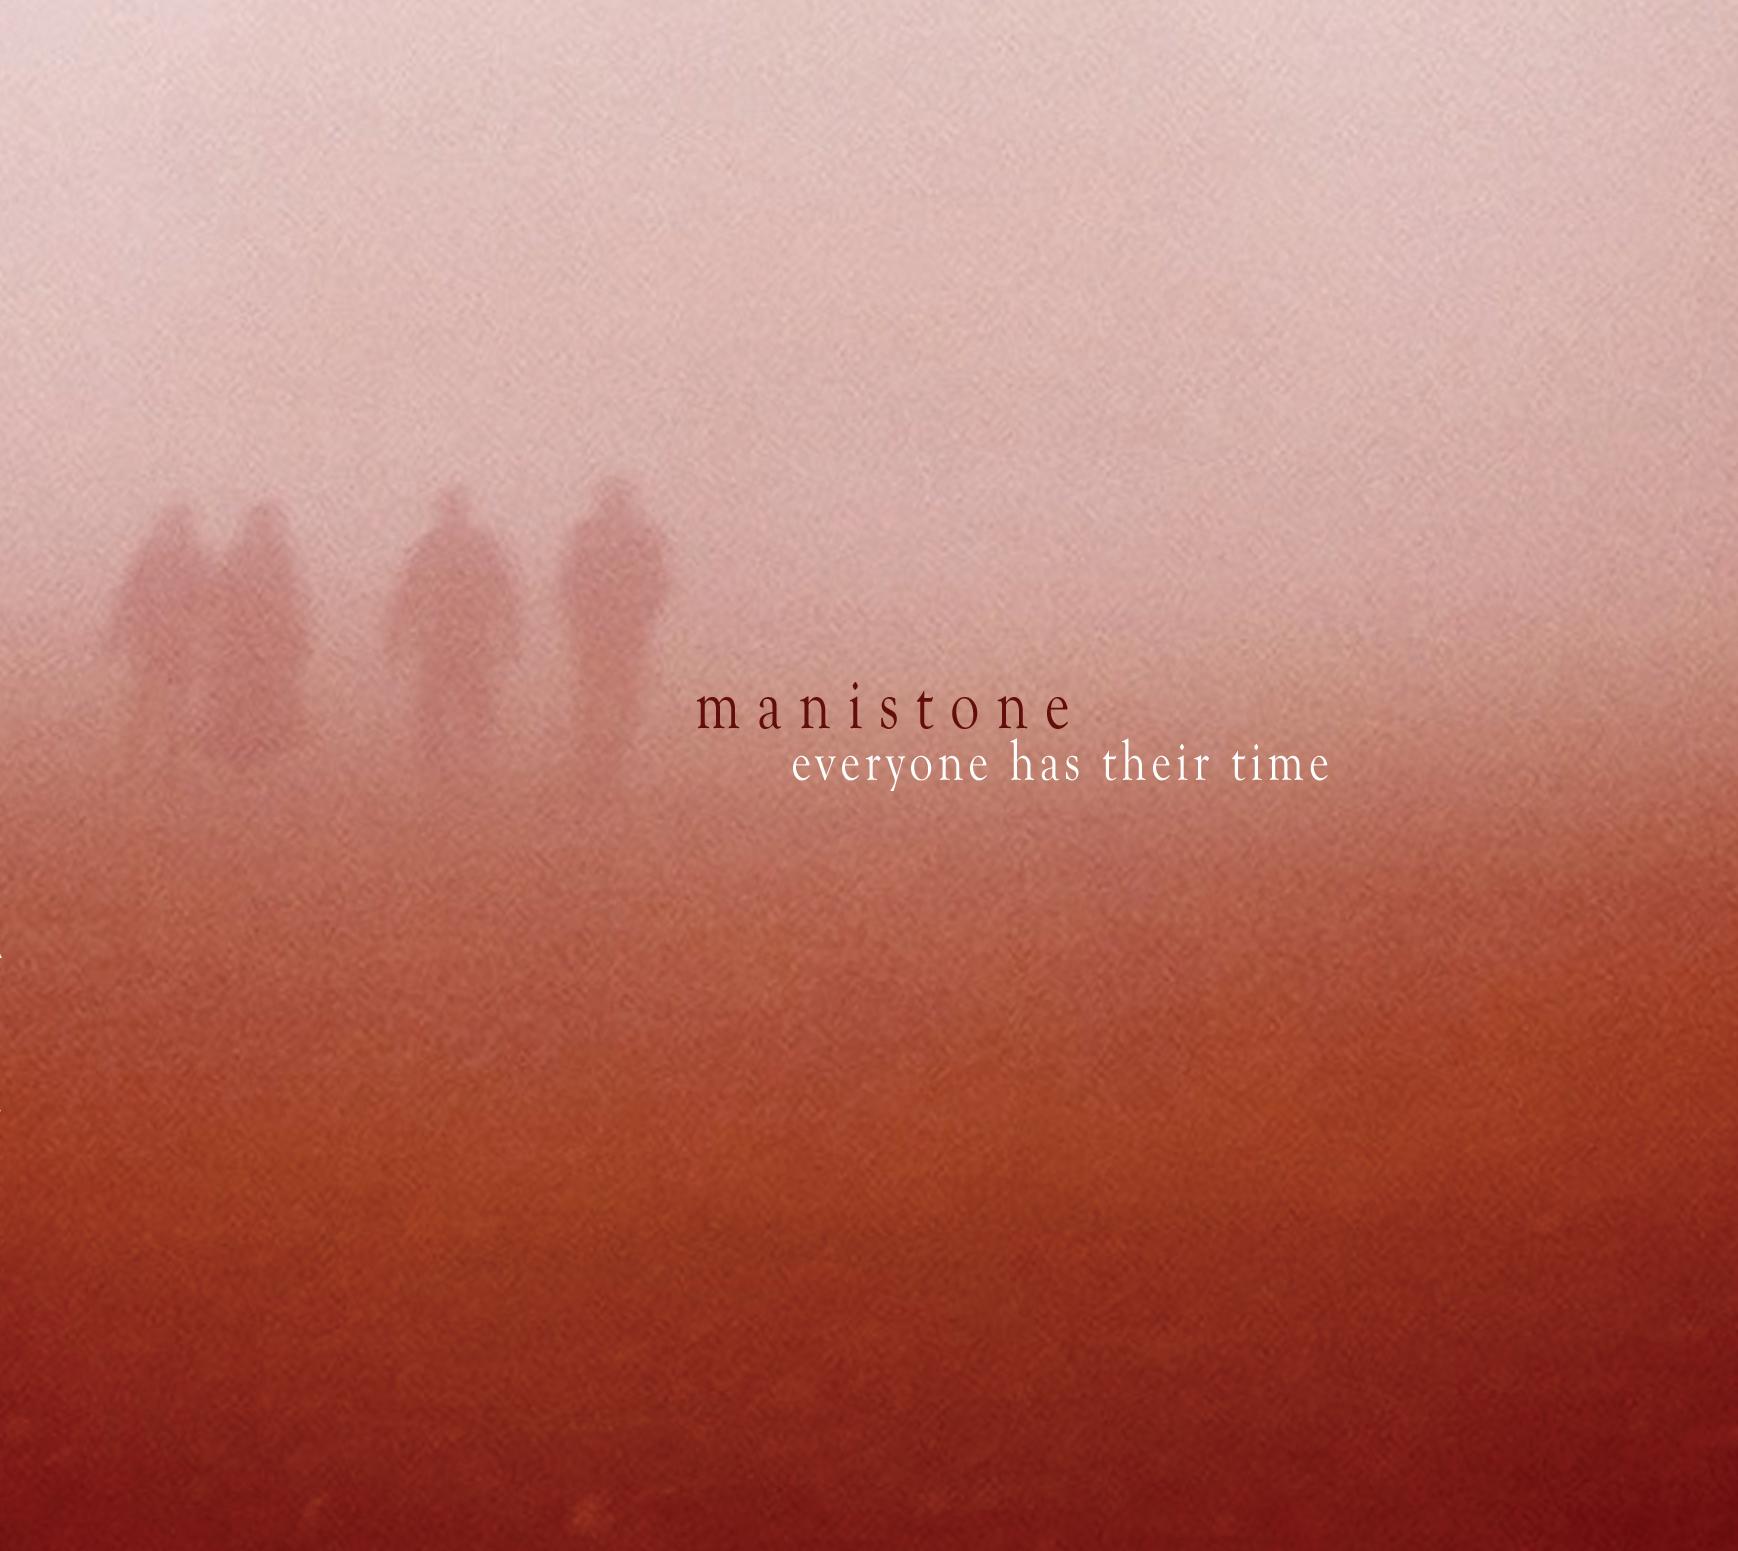 Everyone Has Their Time Album CD Digi Pack (CD-R) - manistone